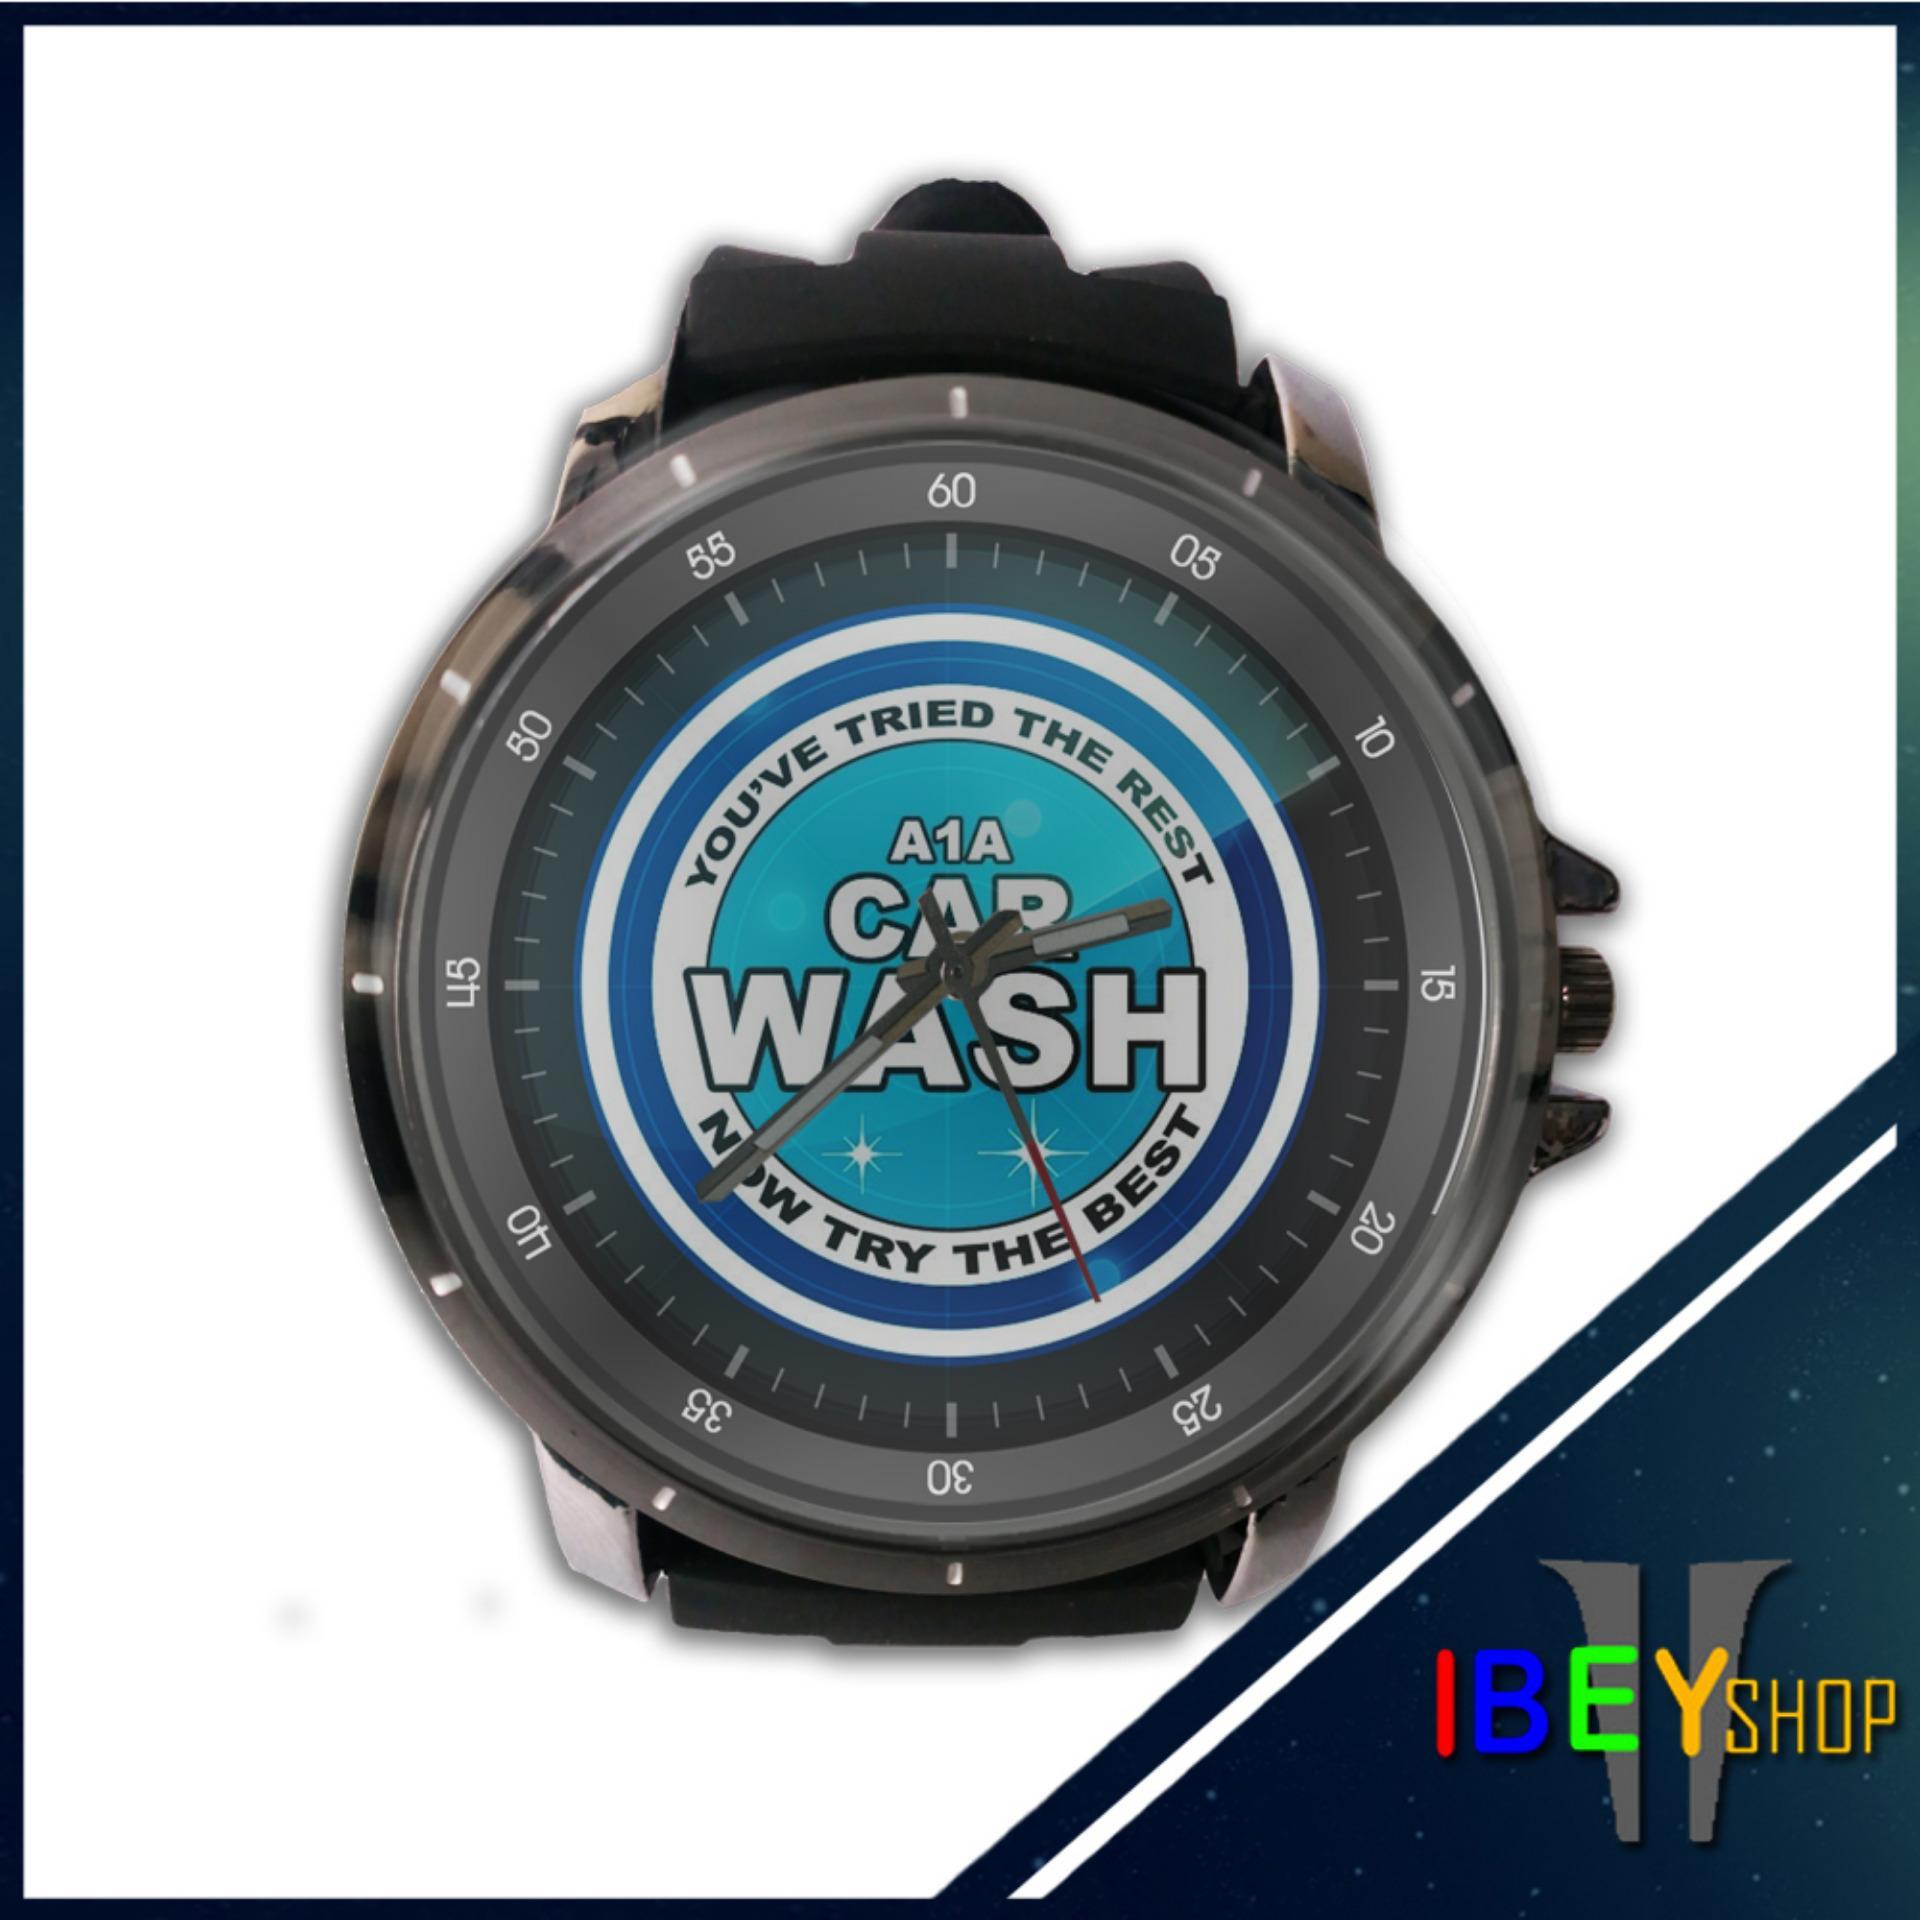 Jam Tangan Custom Breaking Bad A1A Car Wash